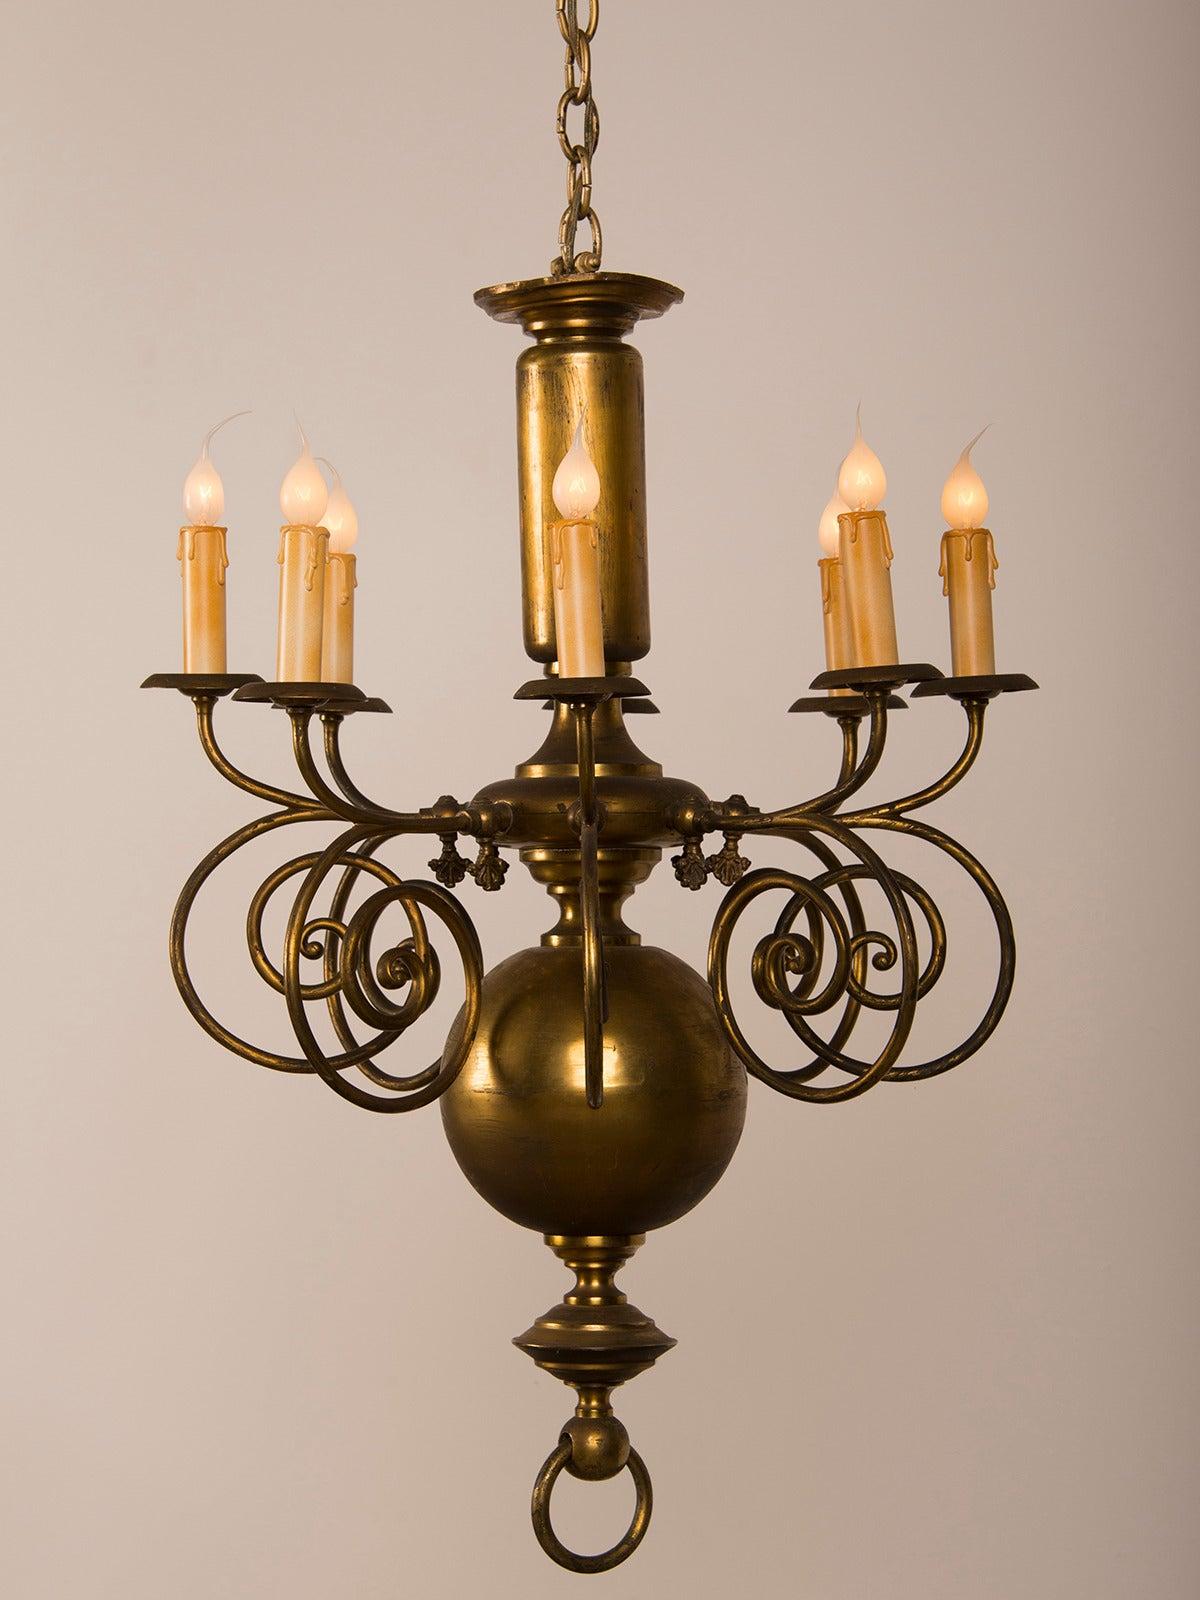 Tall Narrow Antique Dutch Brass Chandelier With Eight